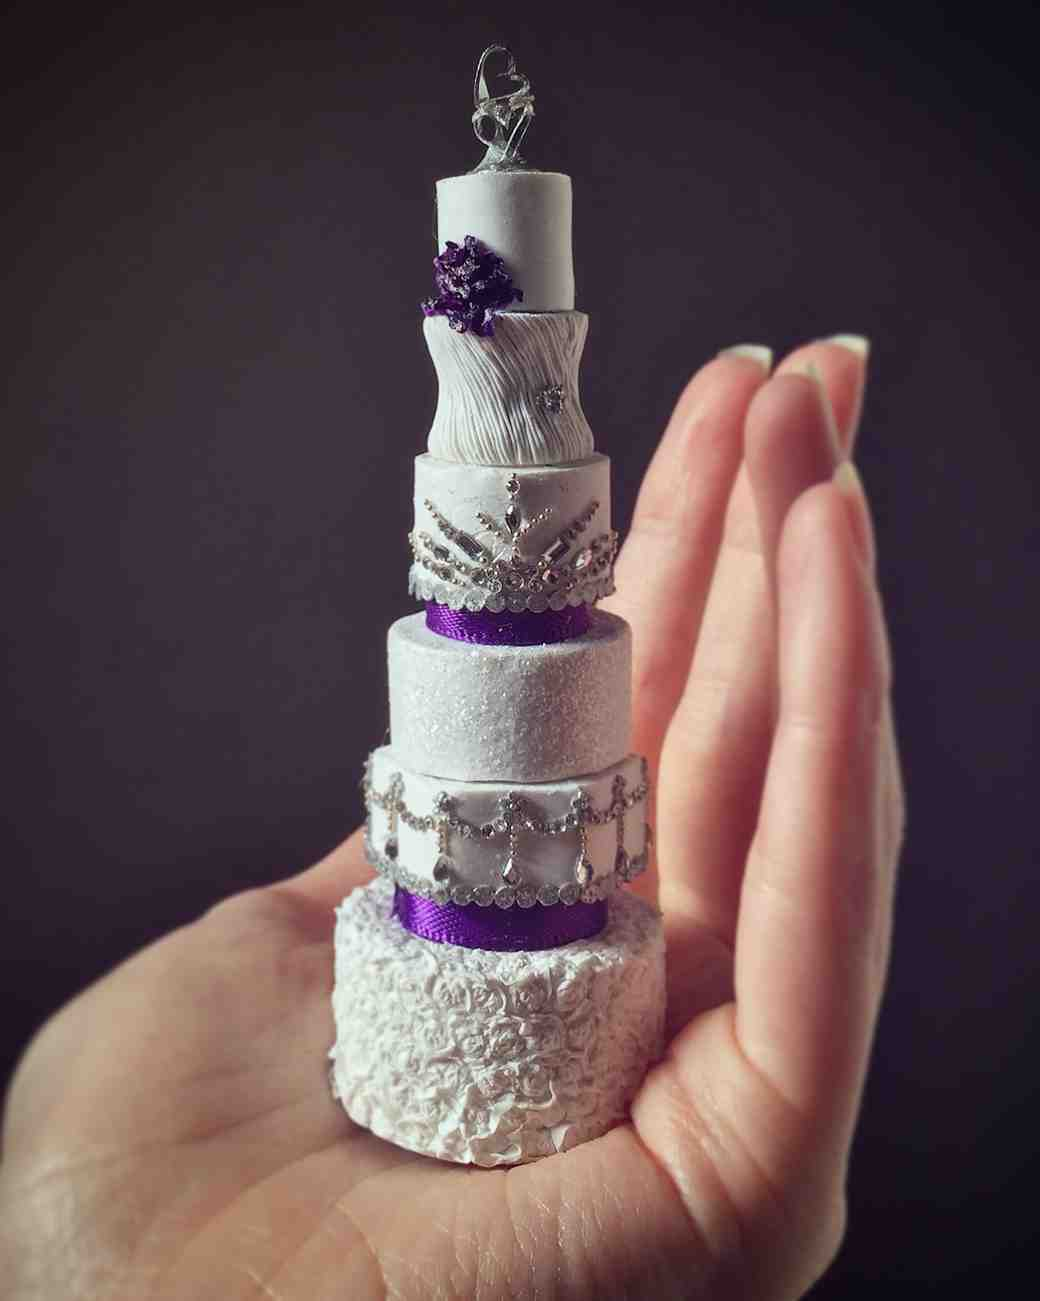 These Miniature Wedding Cakes Are the Ultimate Wedding Keepsake